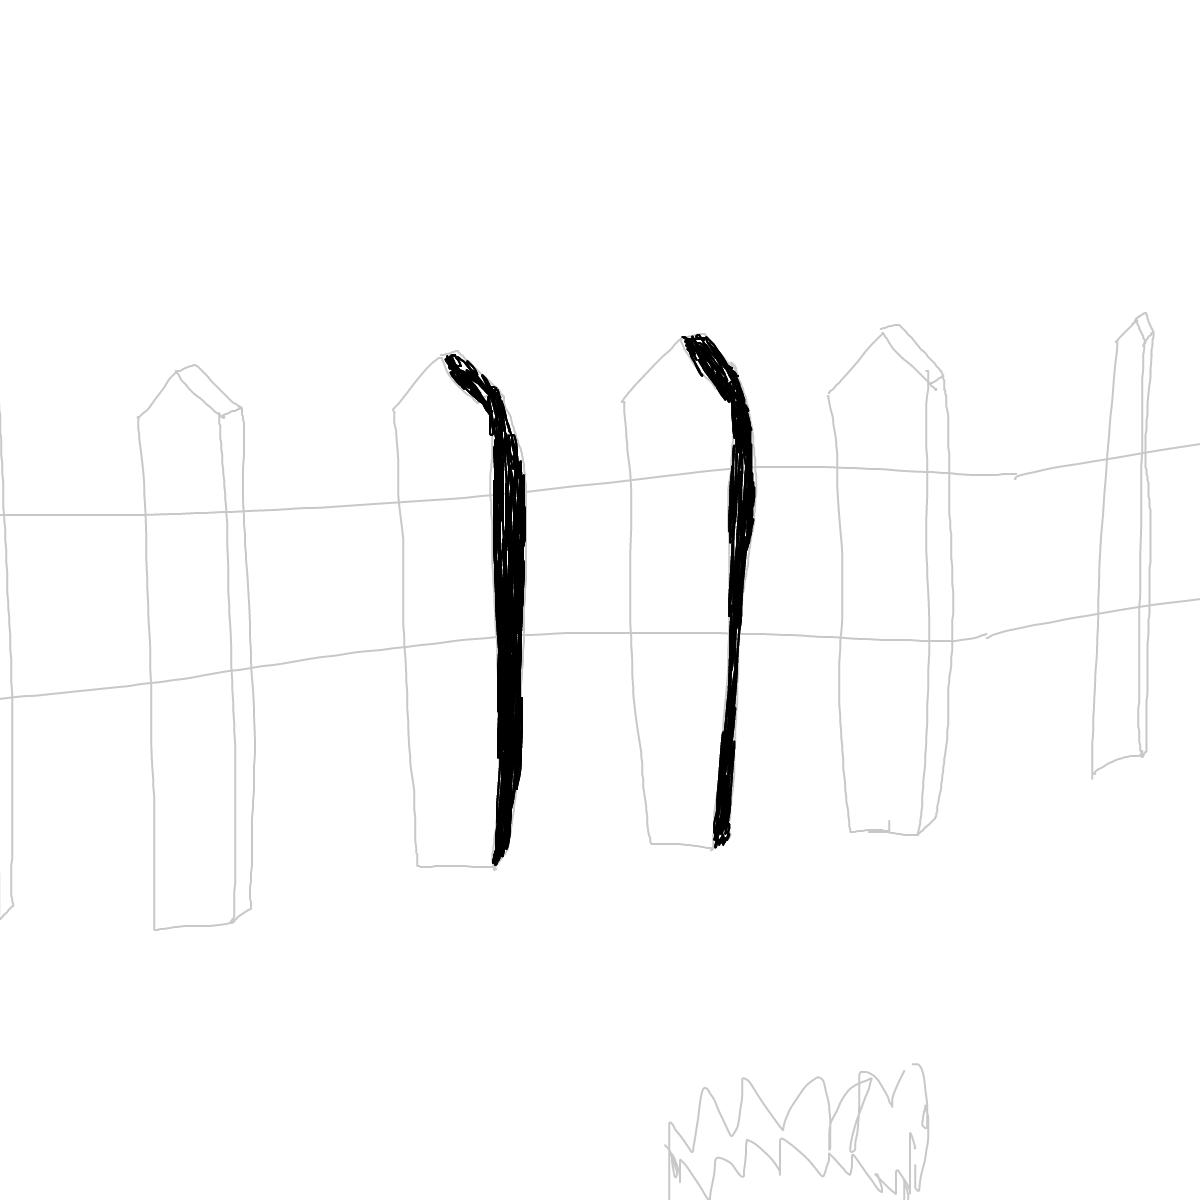 BAAAM drawing#9606 lat:52.4750747680664060lng: 13.4066839218139650